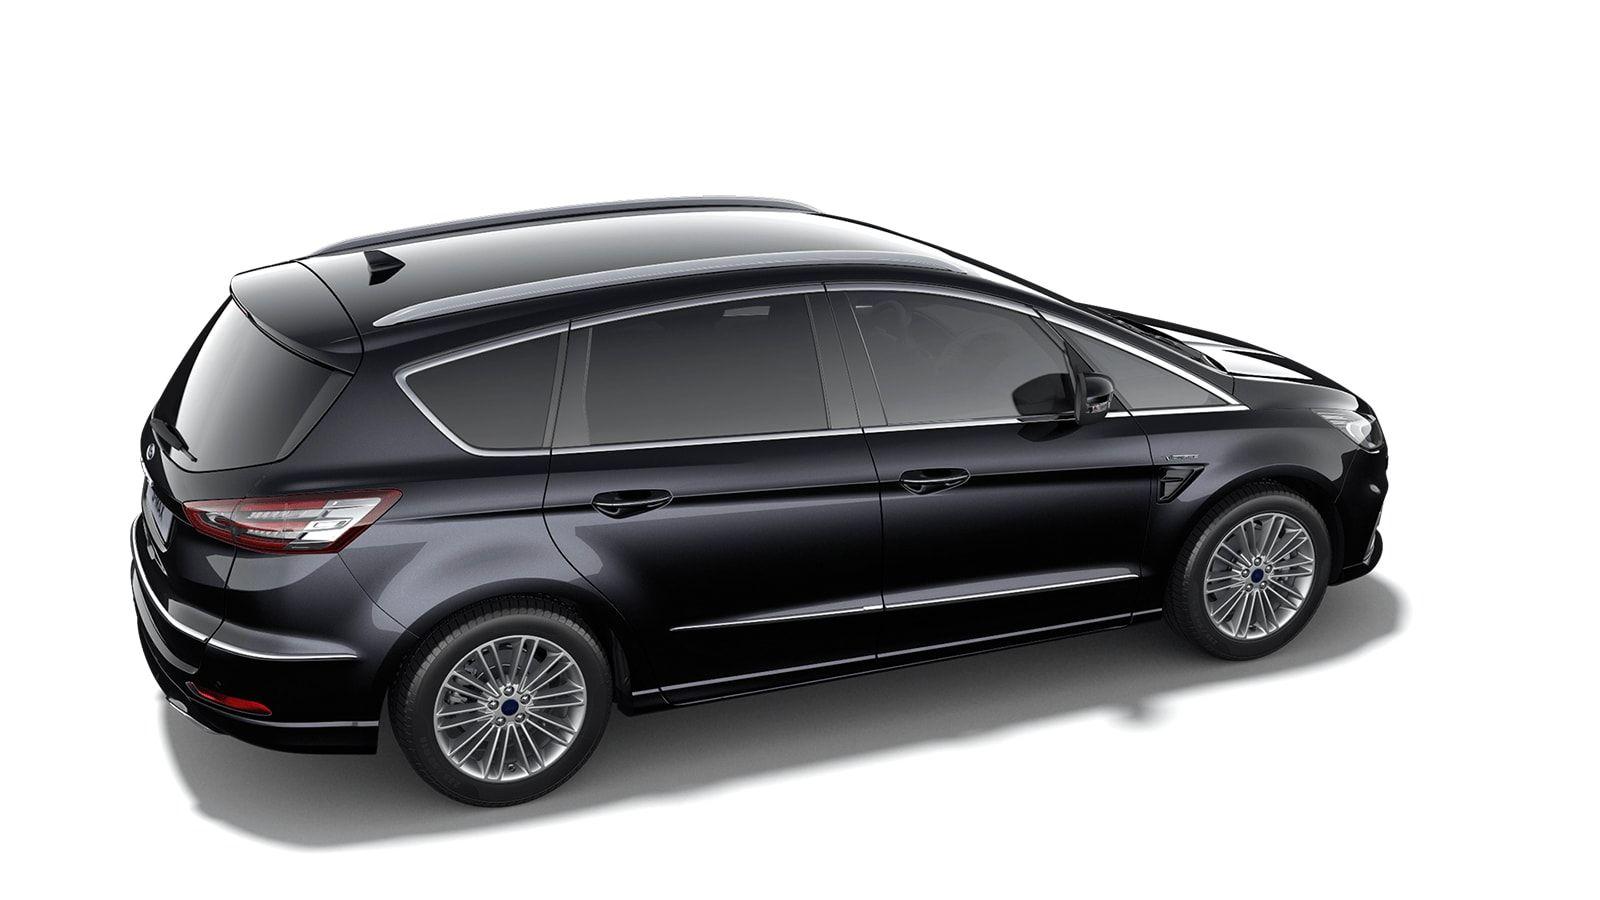 "Nieuw Ford S-max Vignale 2.0 TDCi 190pk / 139kW Auto-Start-Stop A8 - 5d 9I6 - ""Agate Black Vignale"" metaalkleur 3"